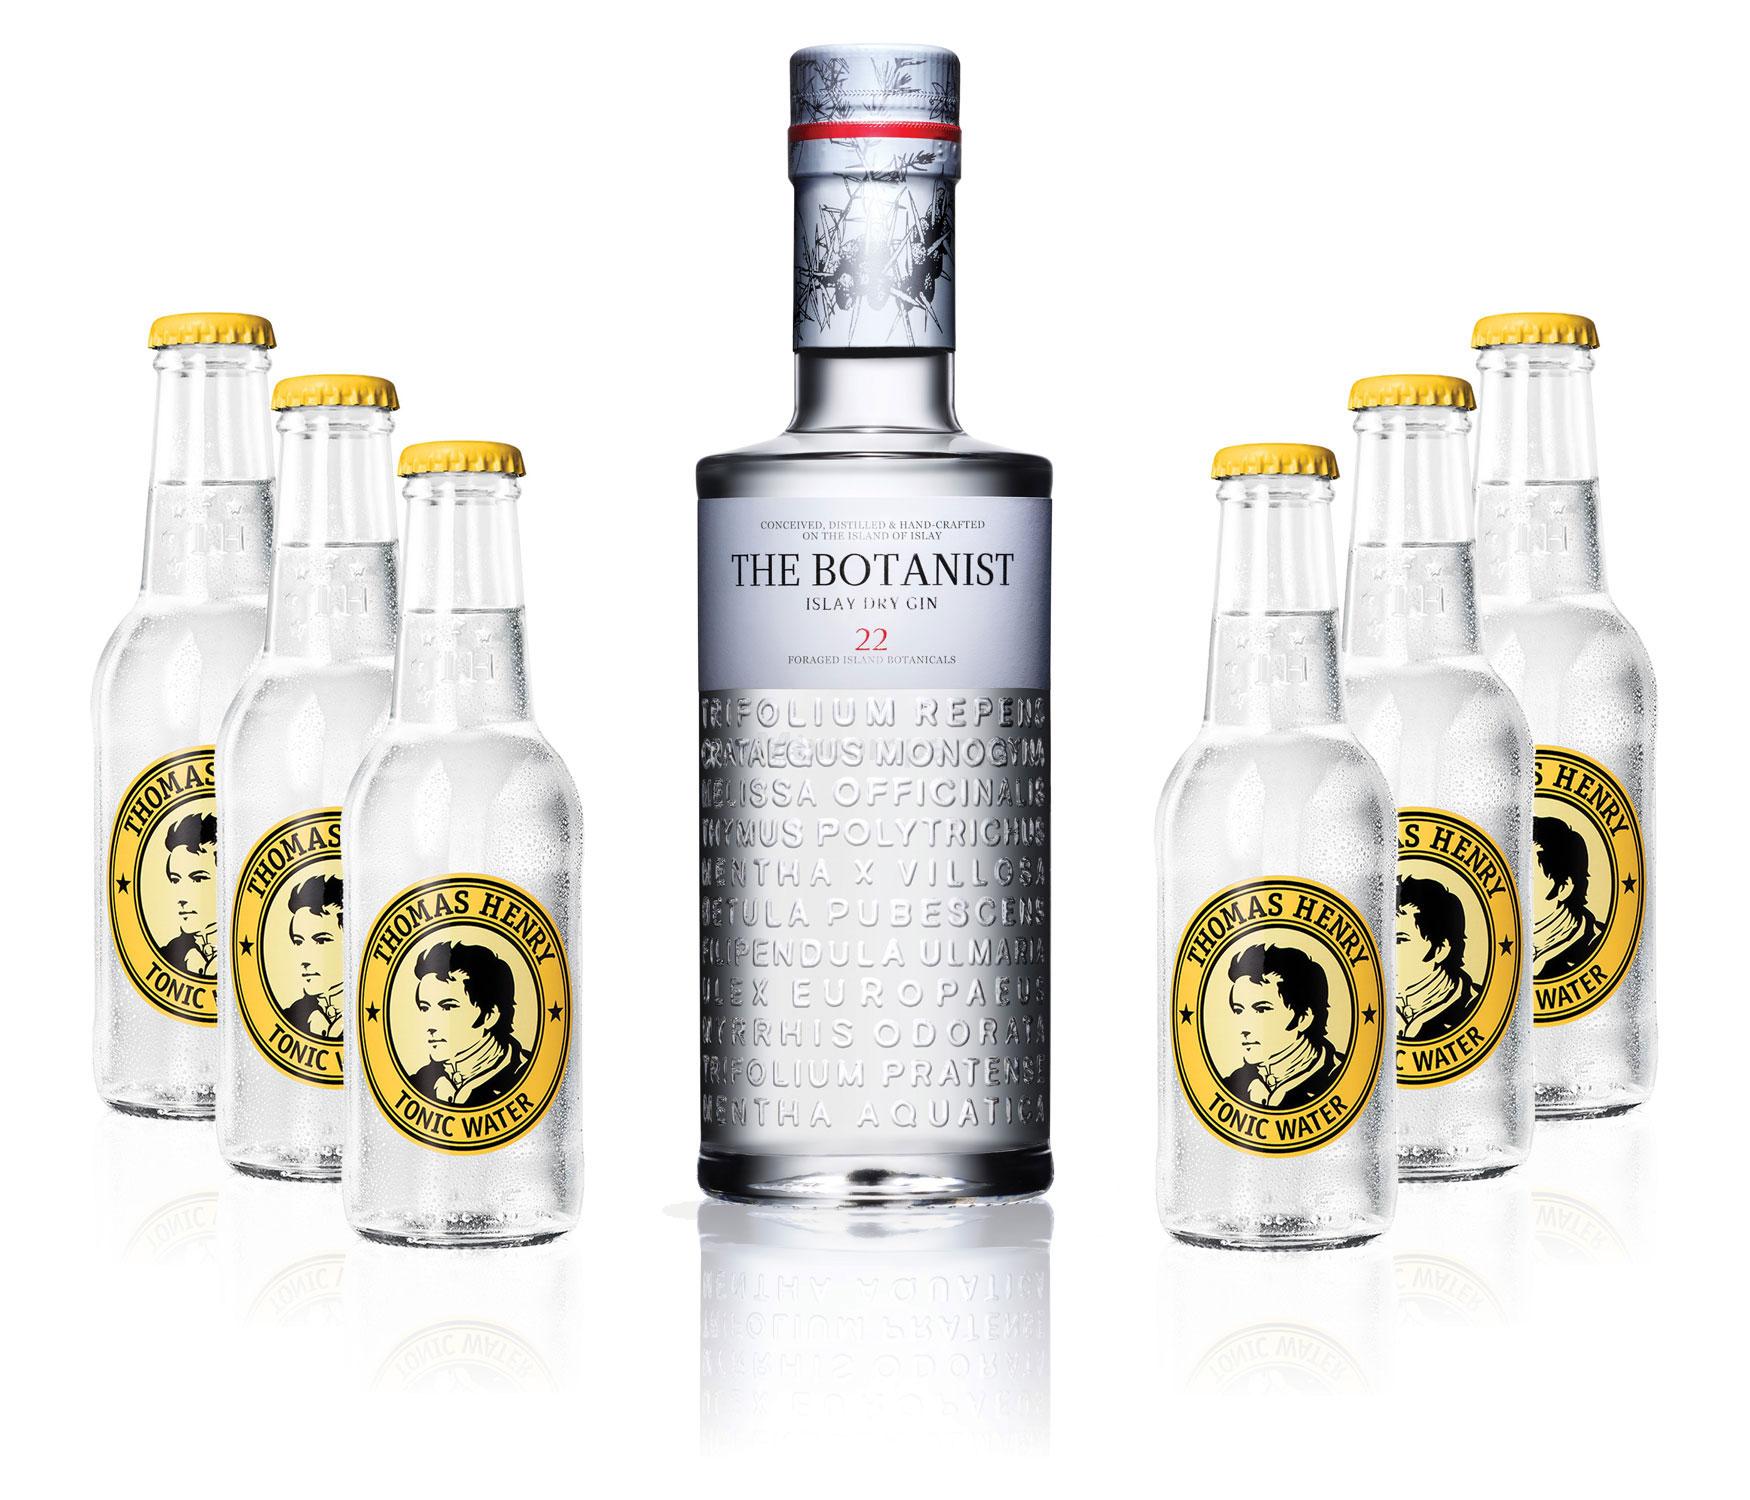 Gin Tonic Set - The Botanist Islay Dry Gin 0,7l 700ml (46% Vol) + 6x Thomas Henry Tonic Water 200ml inkl. Pfand MEHRWEG